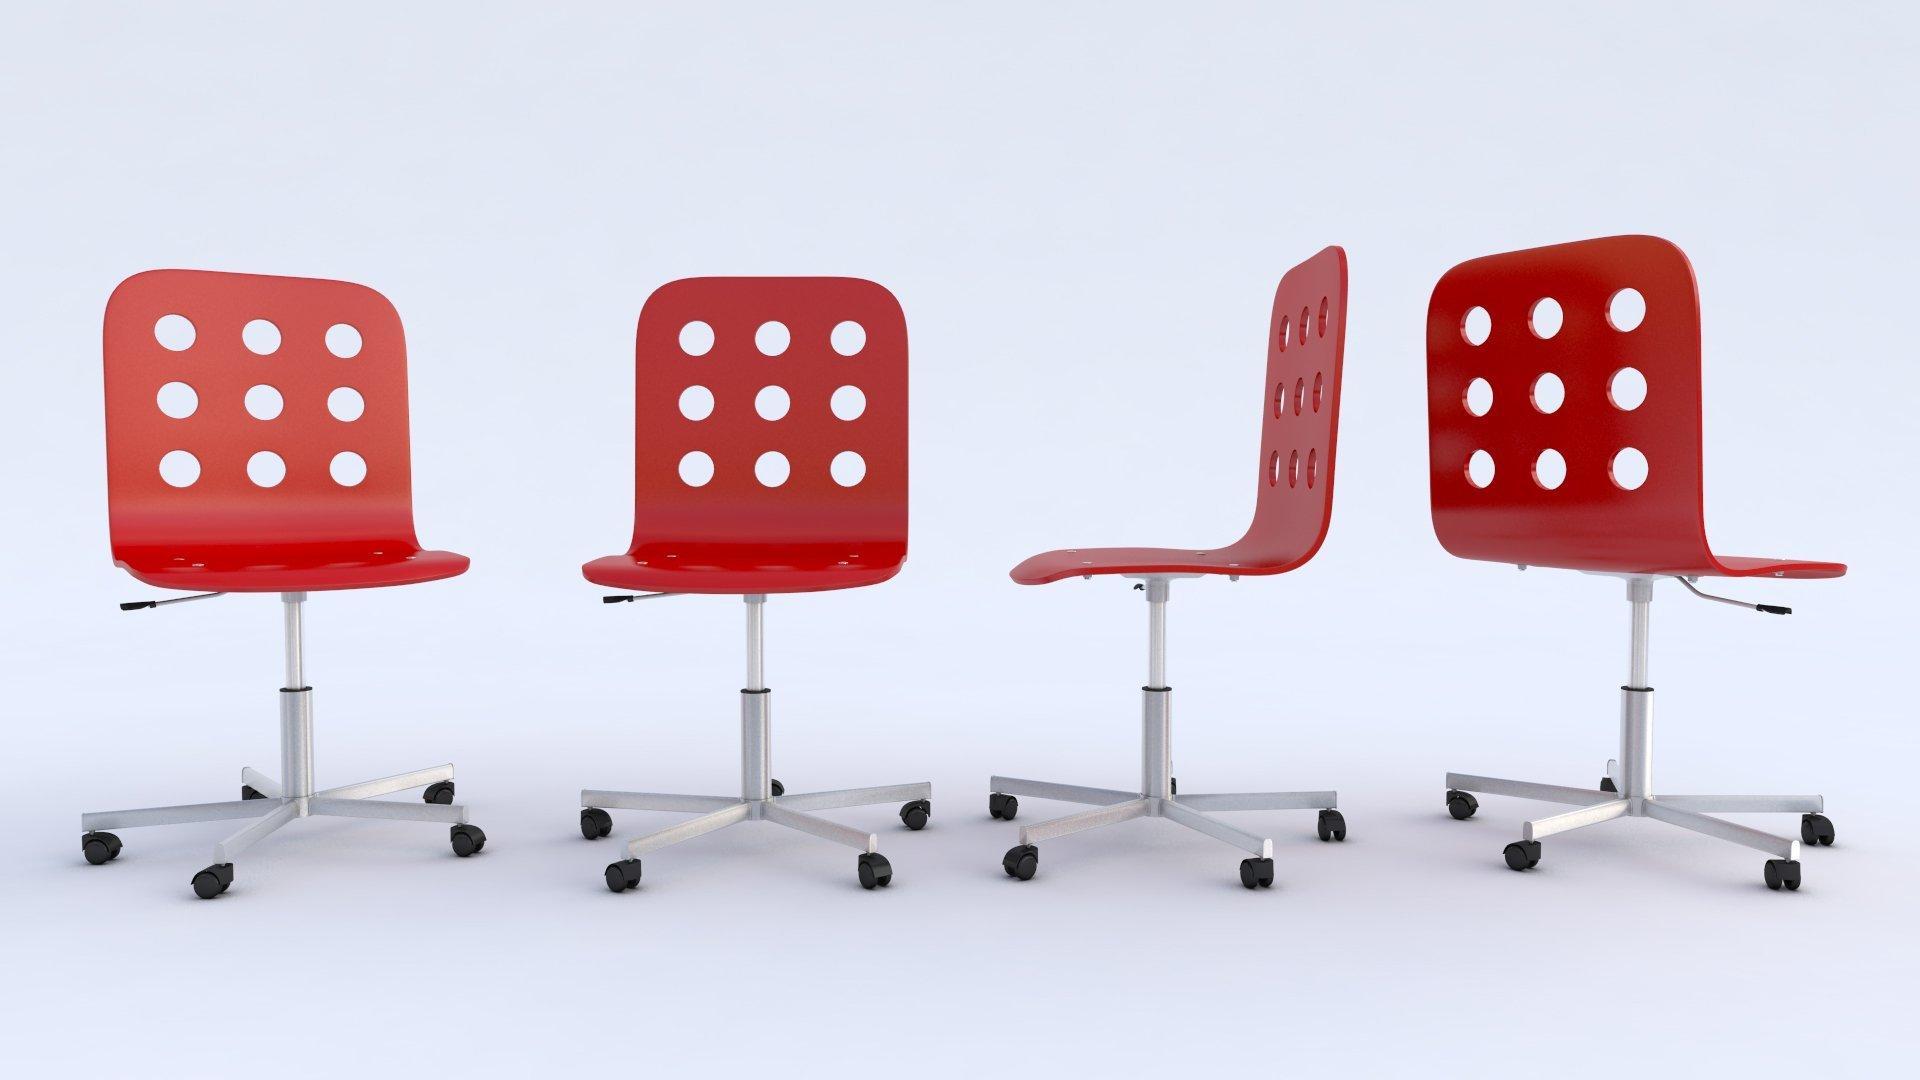 Ikea jules sedia cose di casa - Sedia rotelle ikea ...